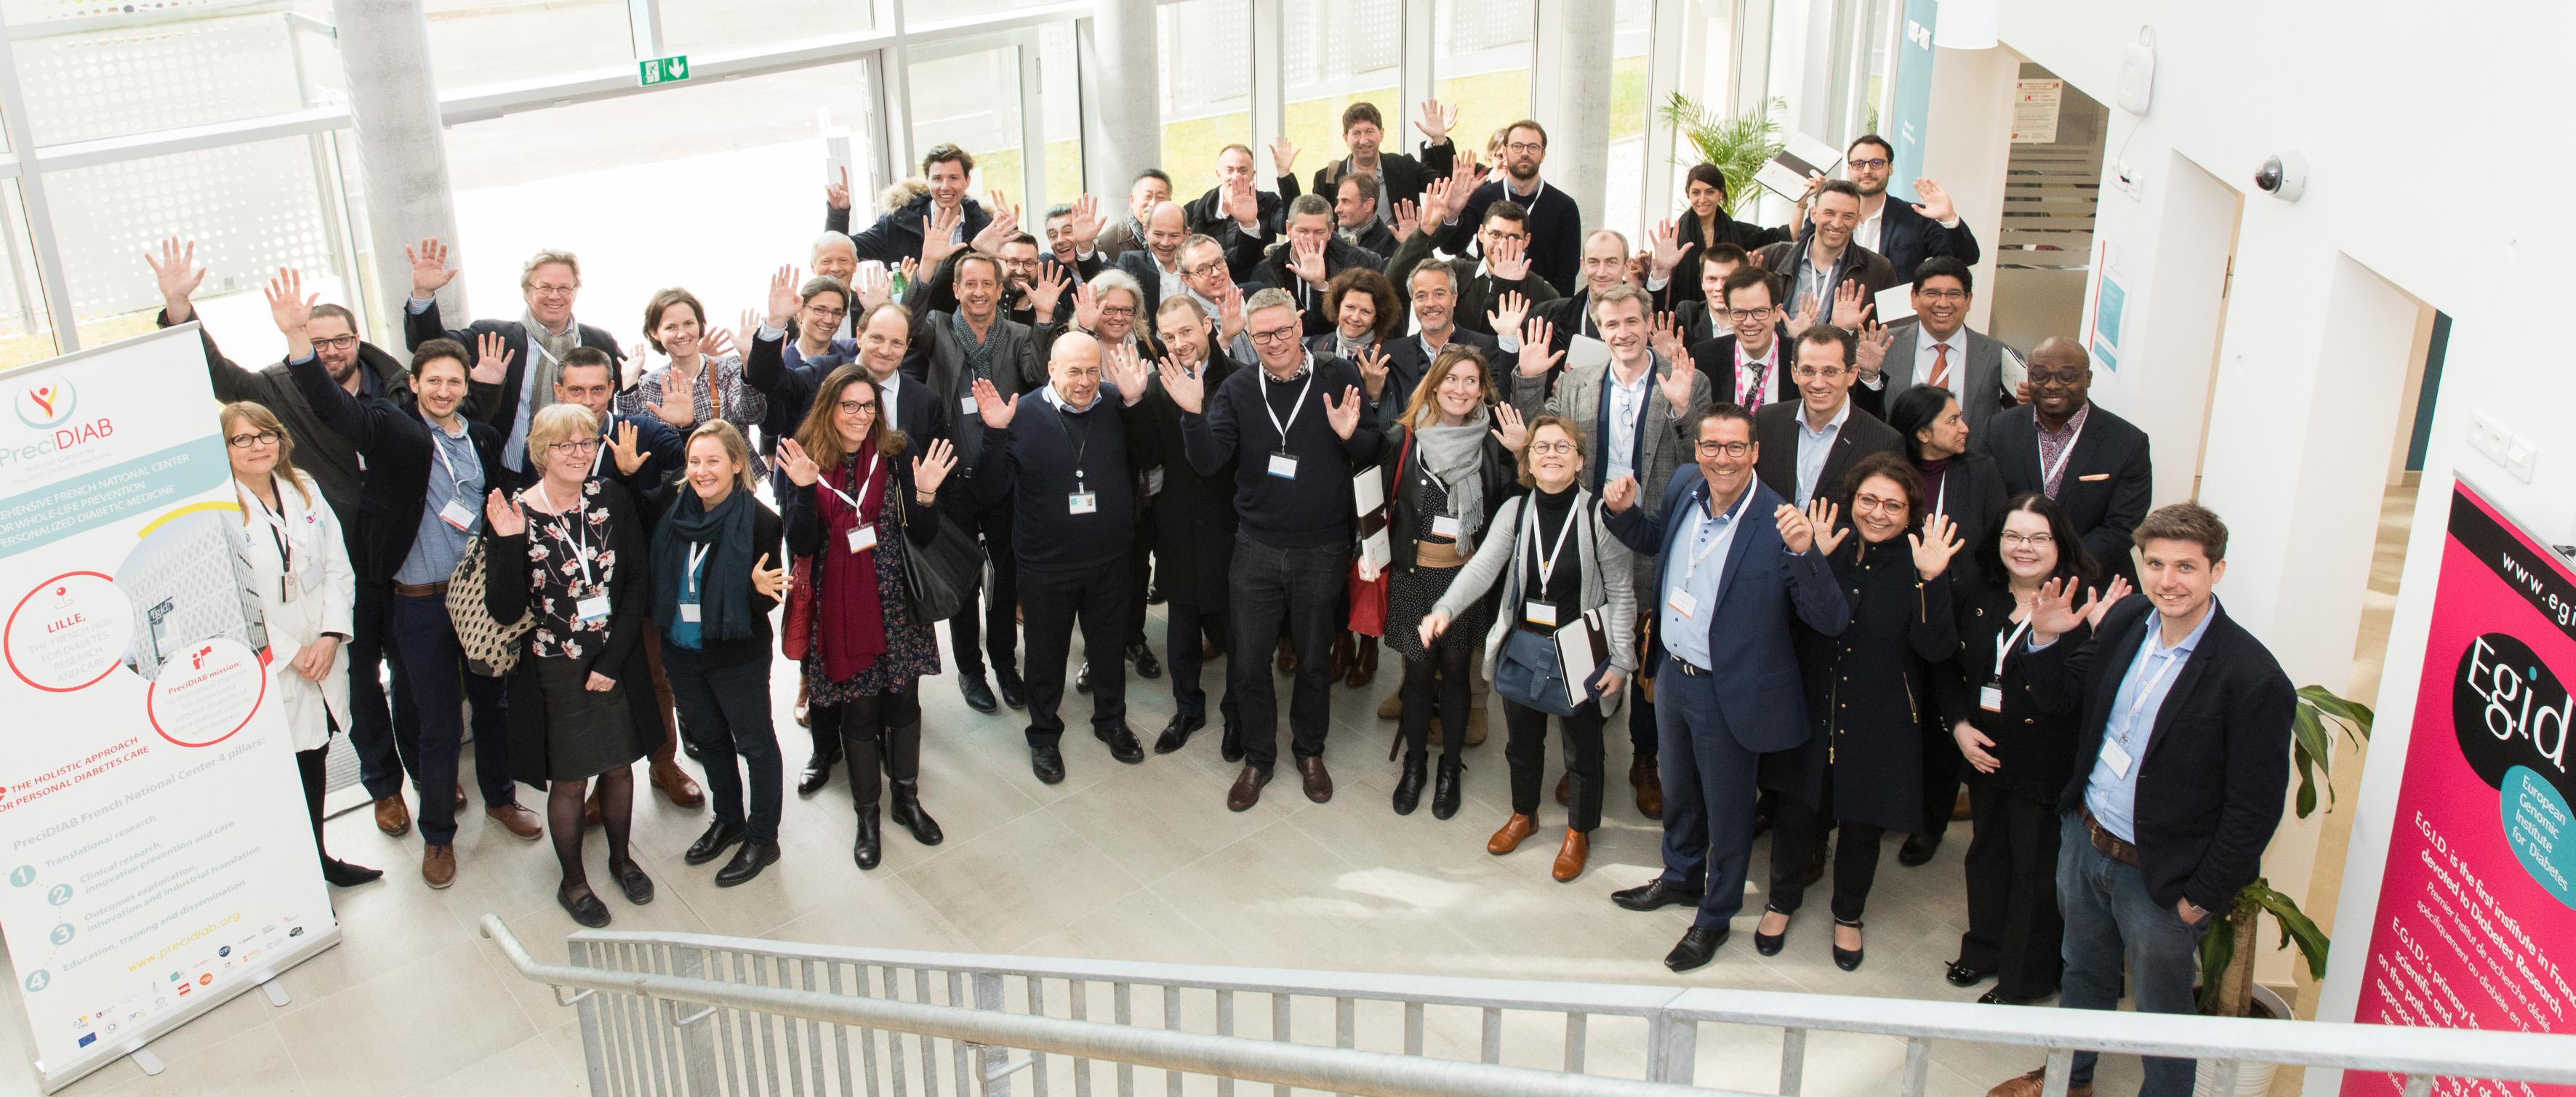 The PreciDIAB Initiative Day – 21 mars 2019